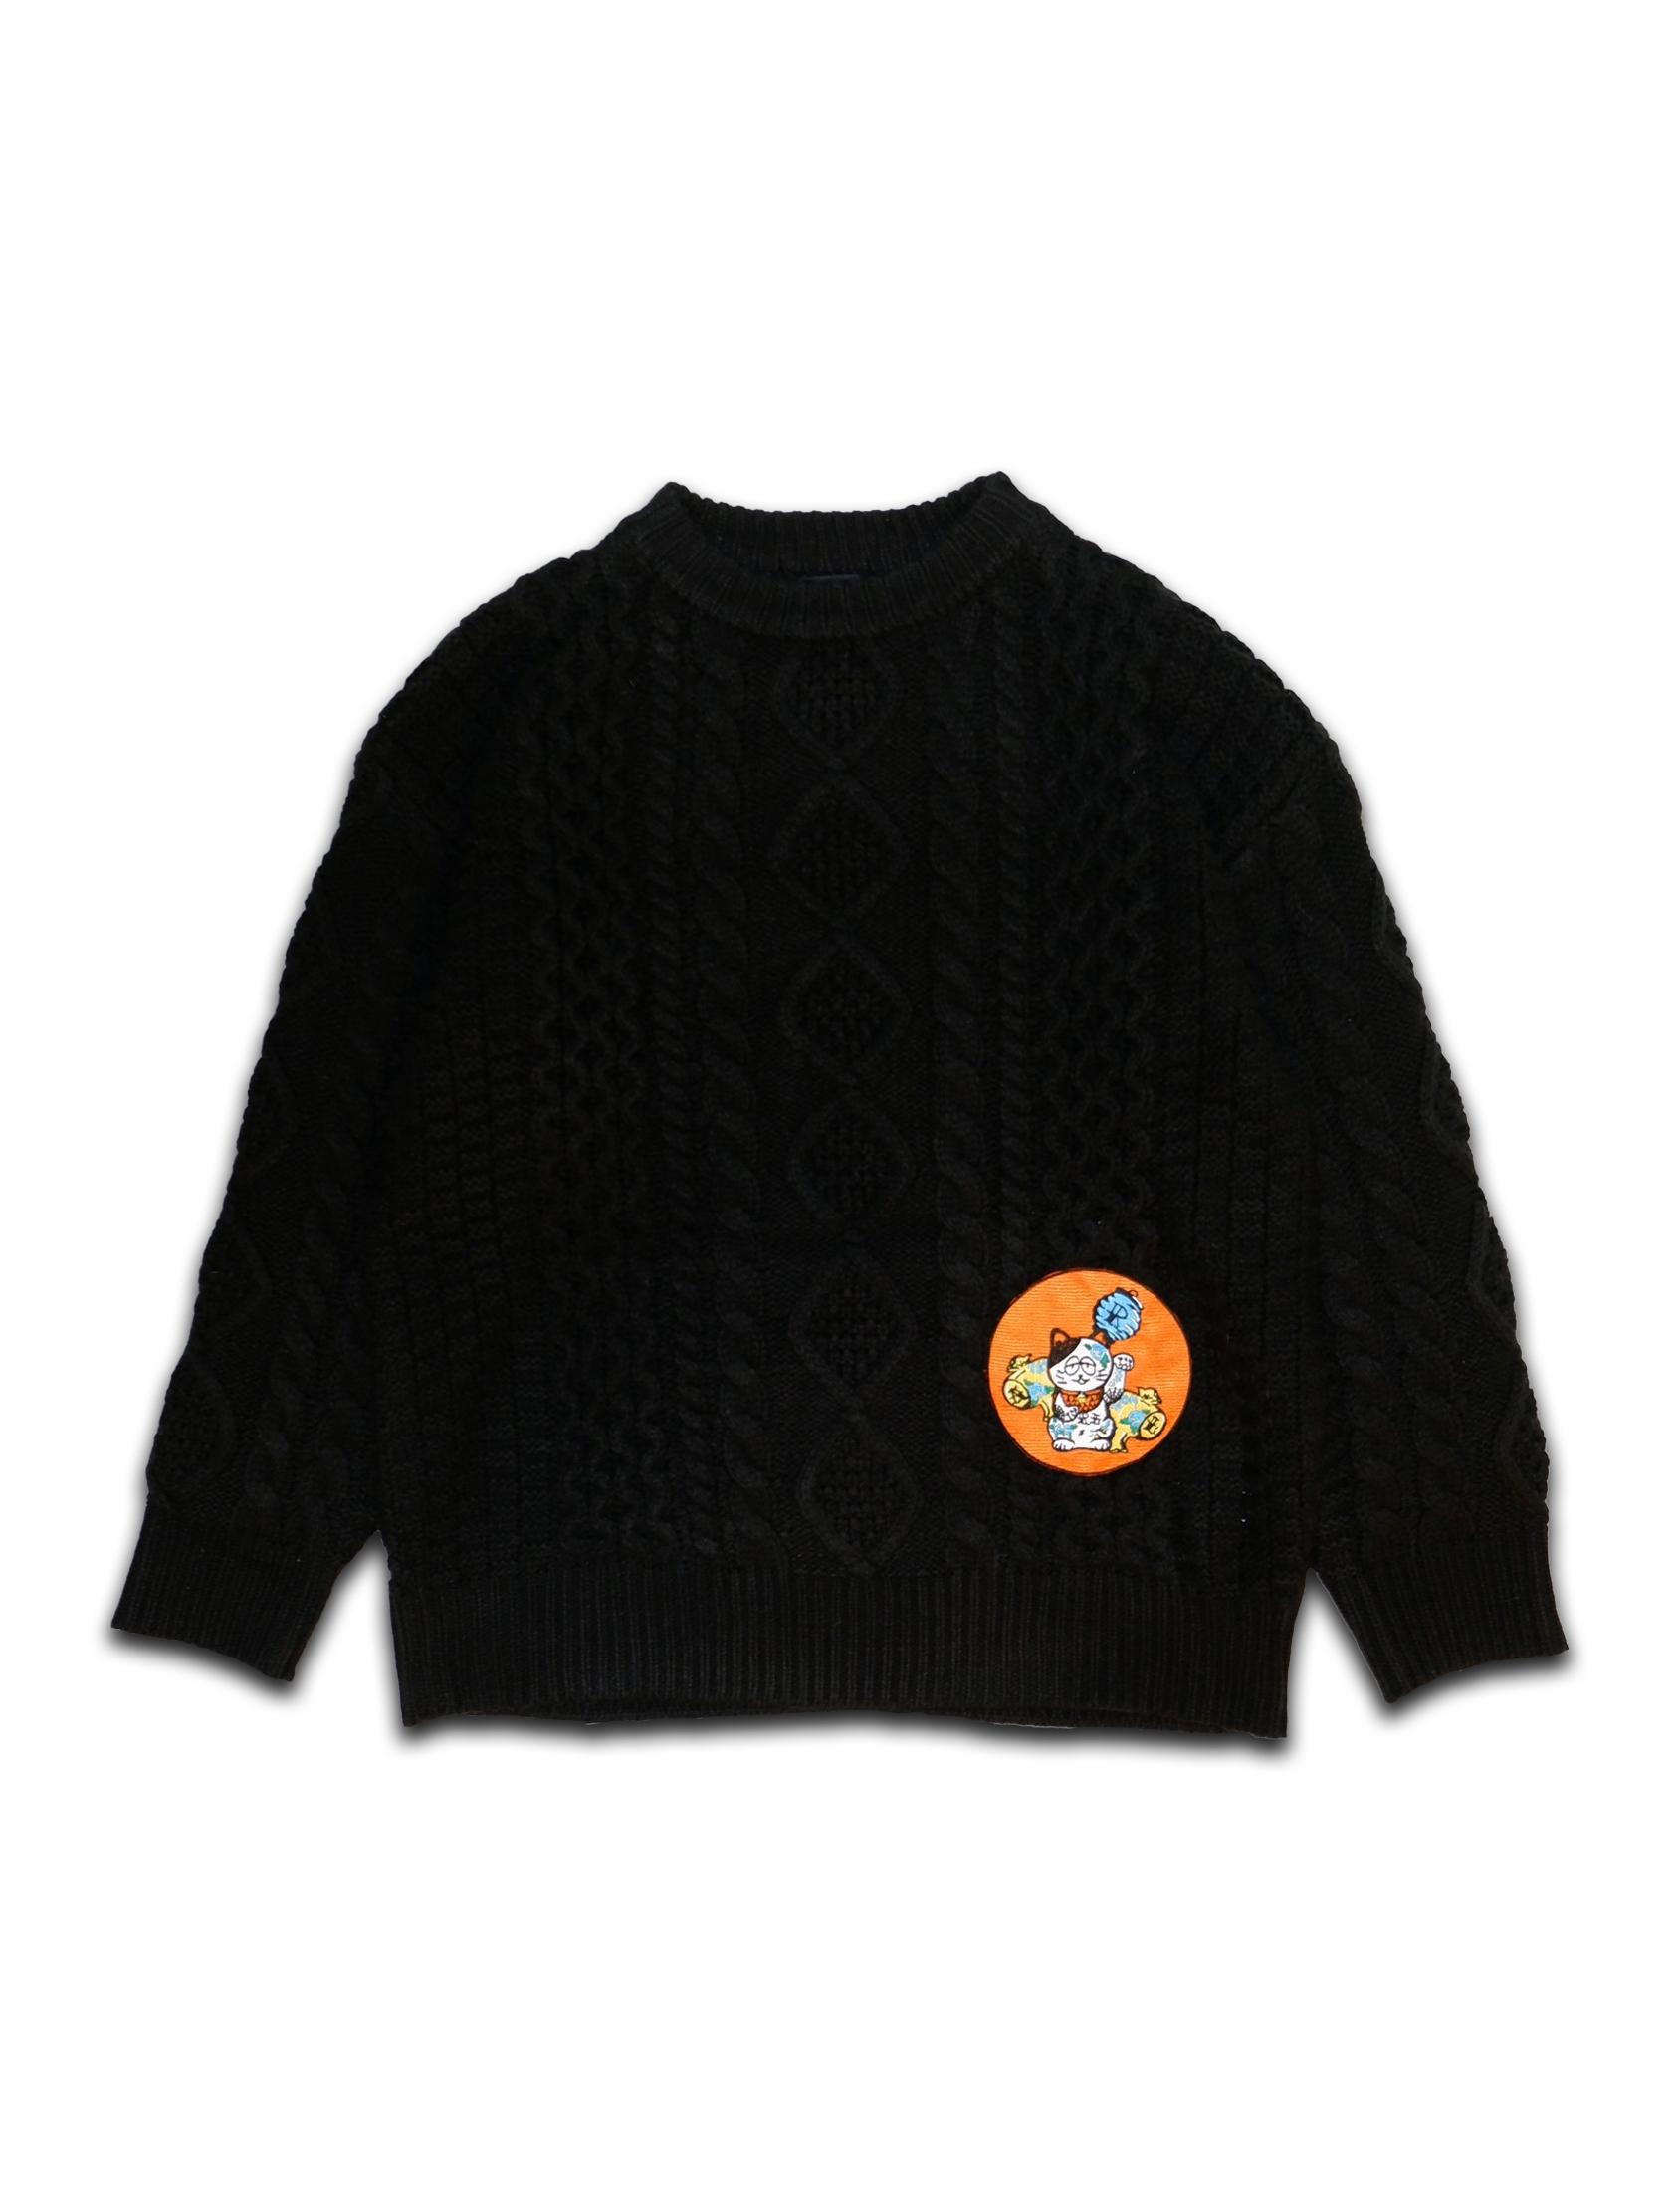 MANEKINEKO PATCH CREW NECK SWEATER black